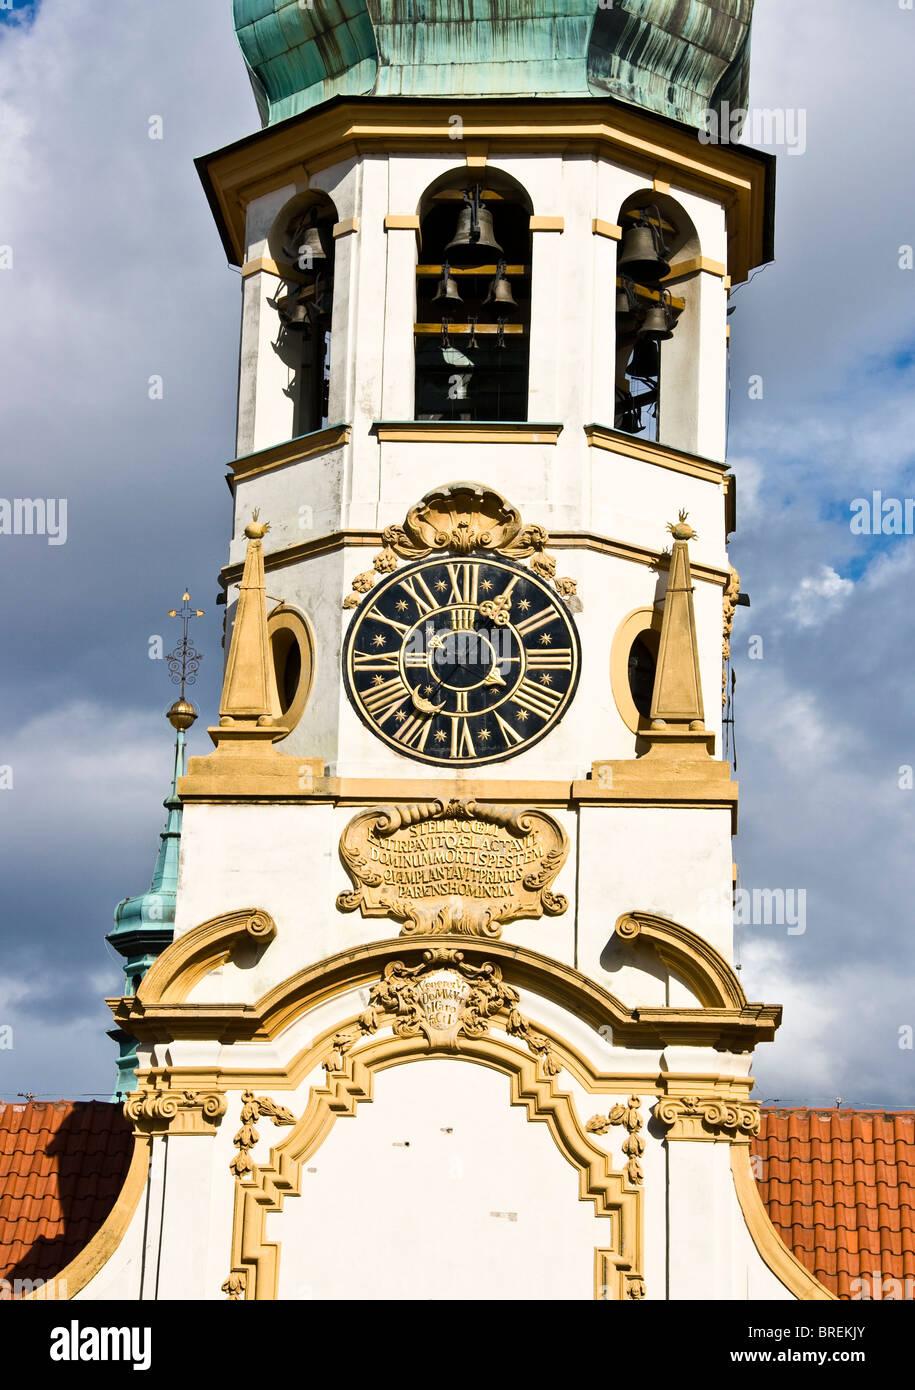 Baroque clock tower of Loreta Church Prague Czech Republic Europe Stock Photo